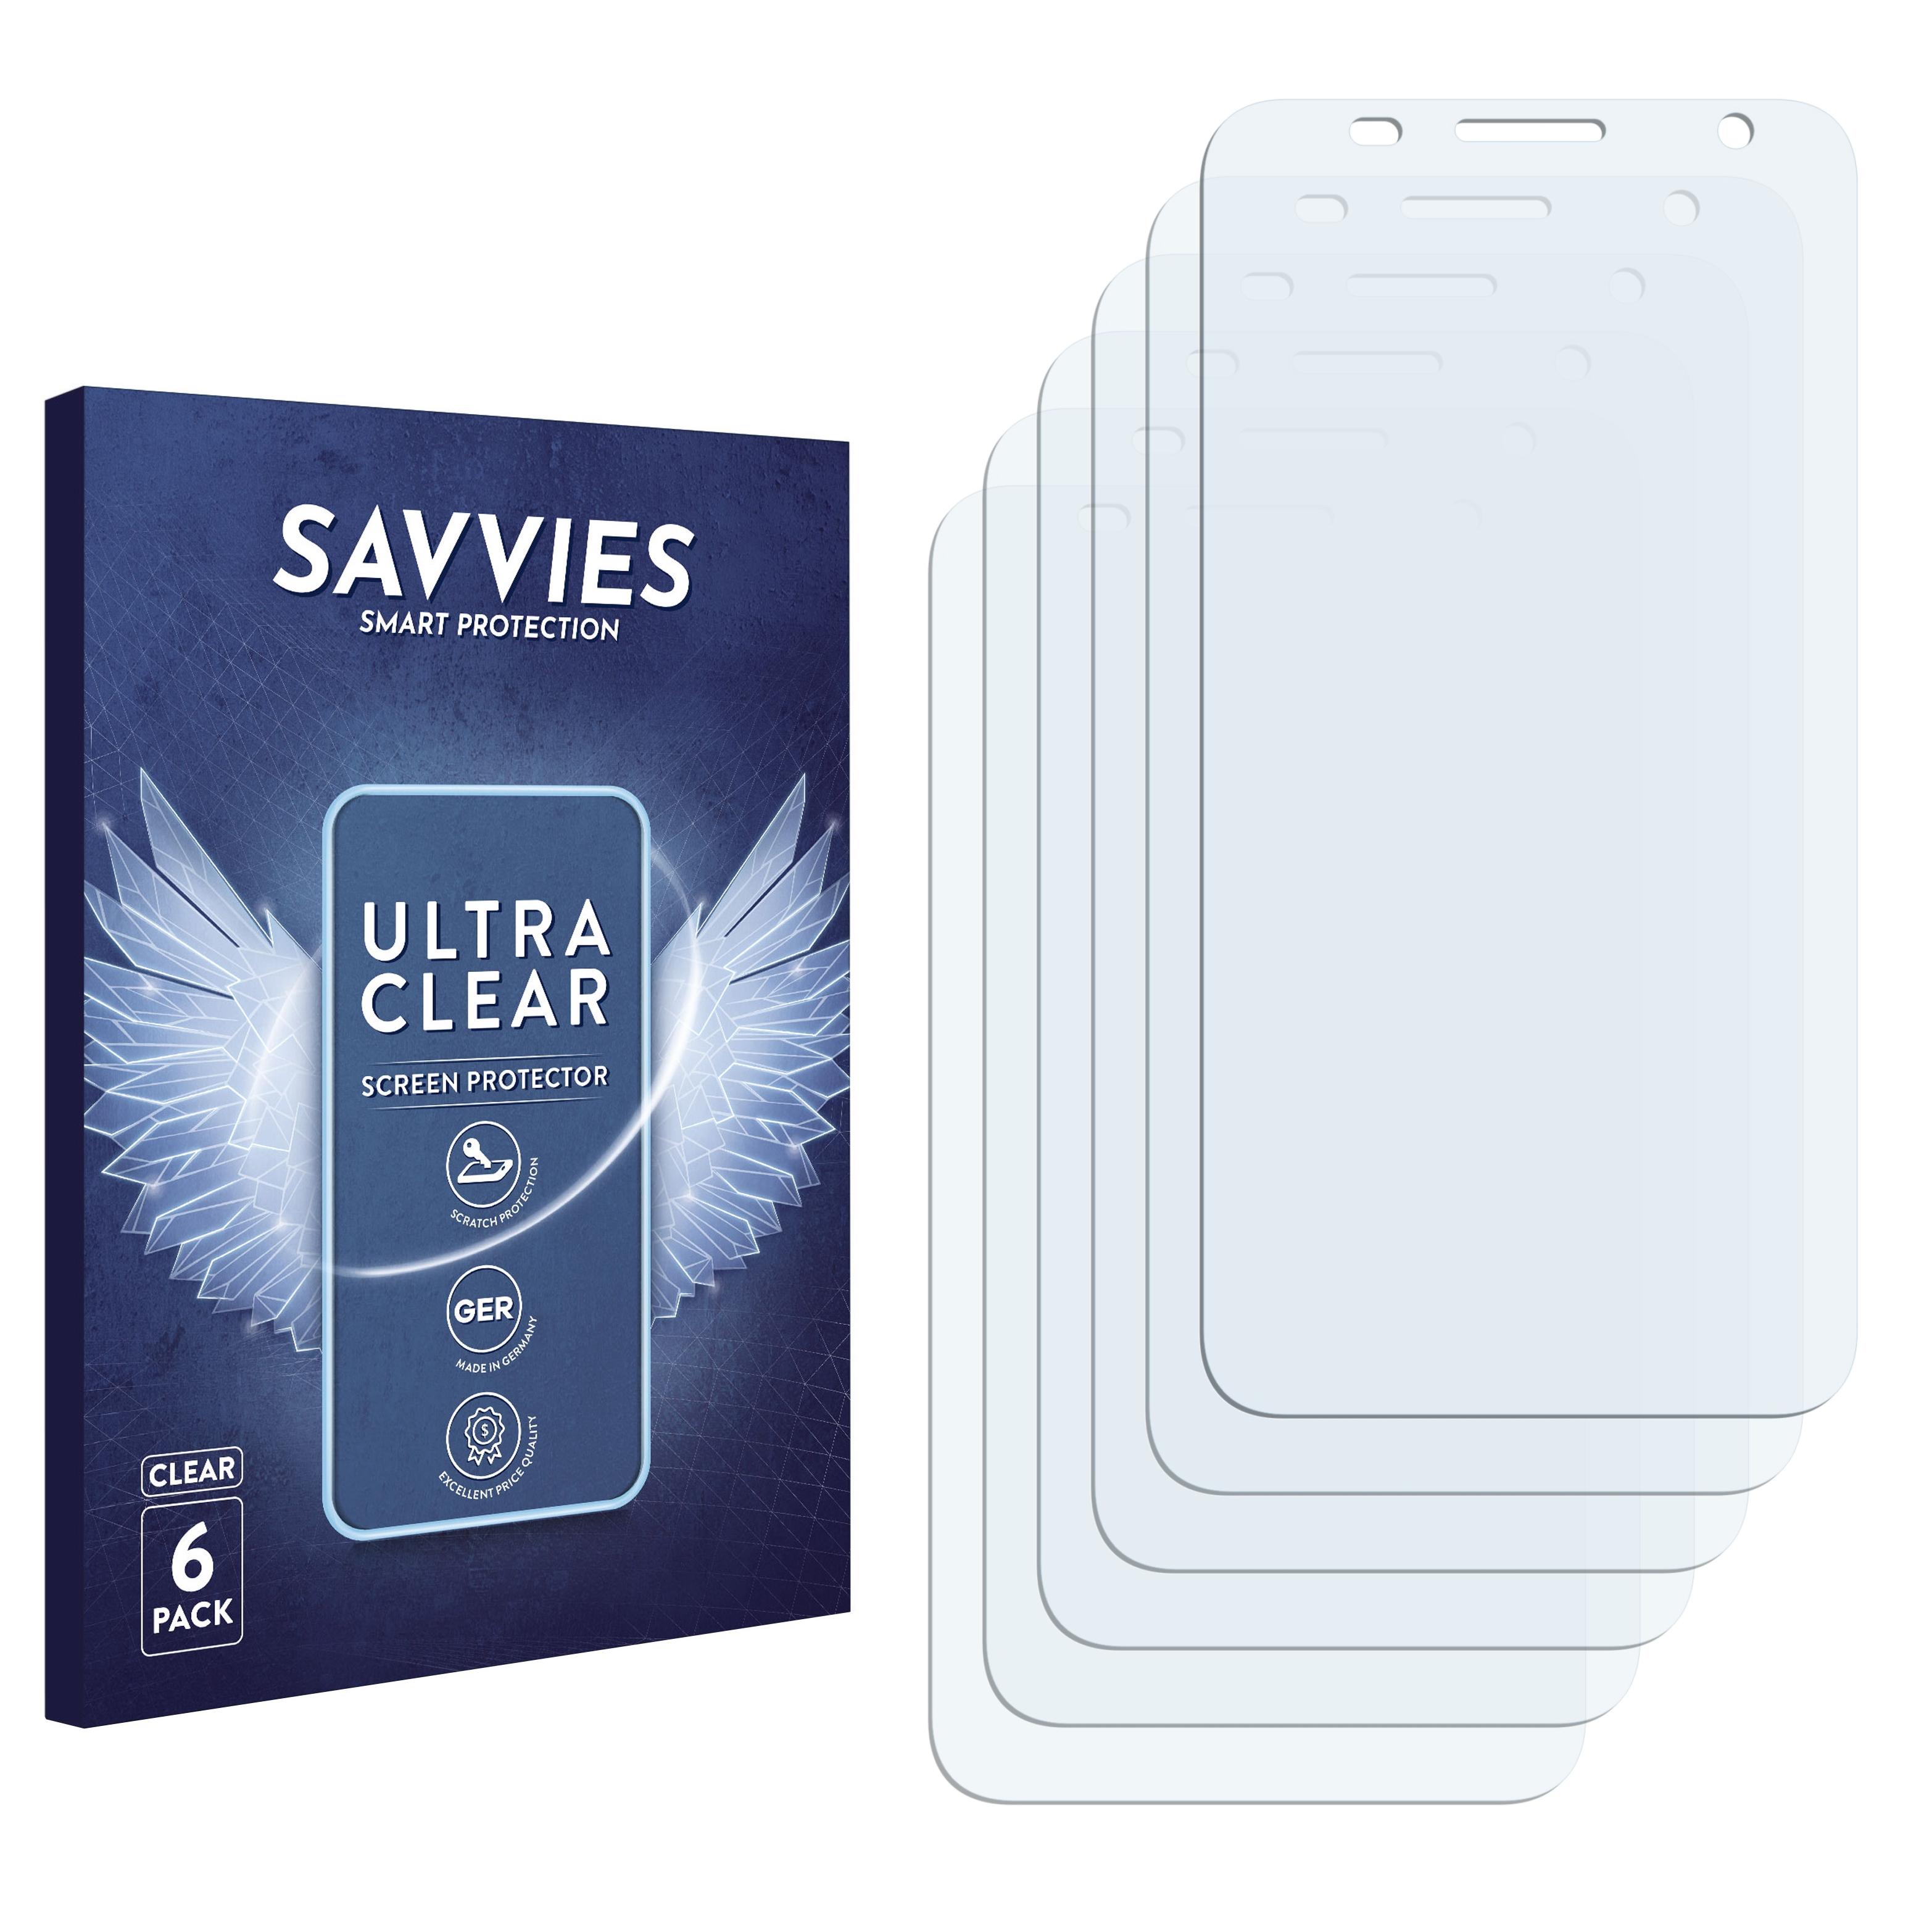 6x Savvies SU75 čirá ochranná fólie pro Alcatel One Touch Flash 6042D